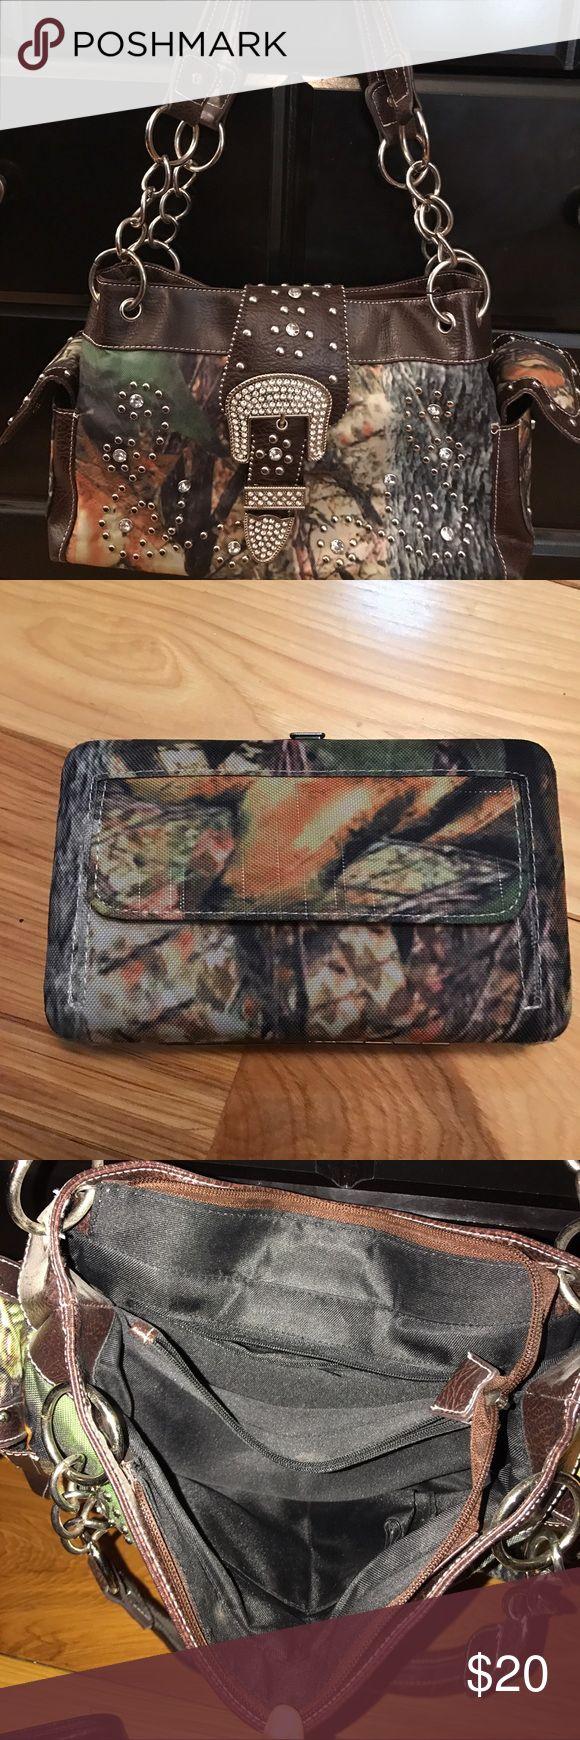 Camo Purse Camo Purse and wallet great condition! Camo Bags Shoulder Bags